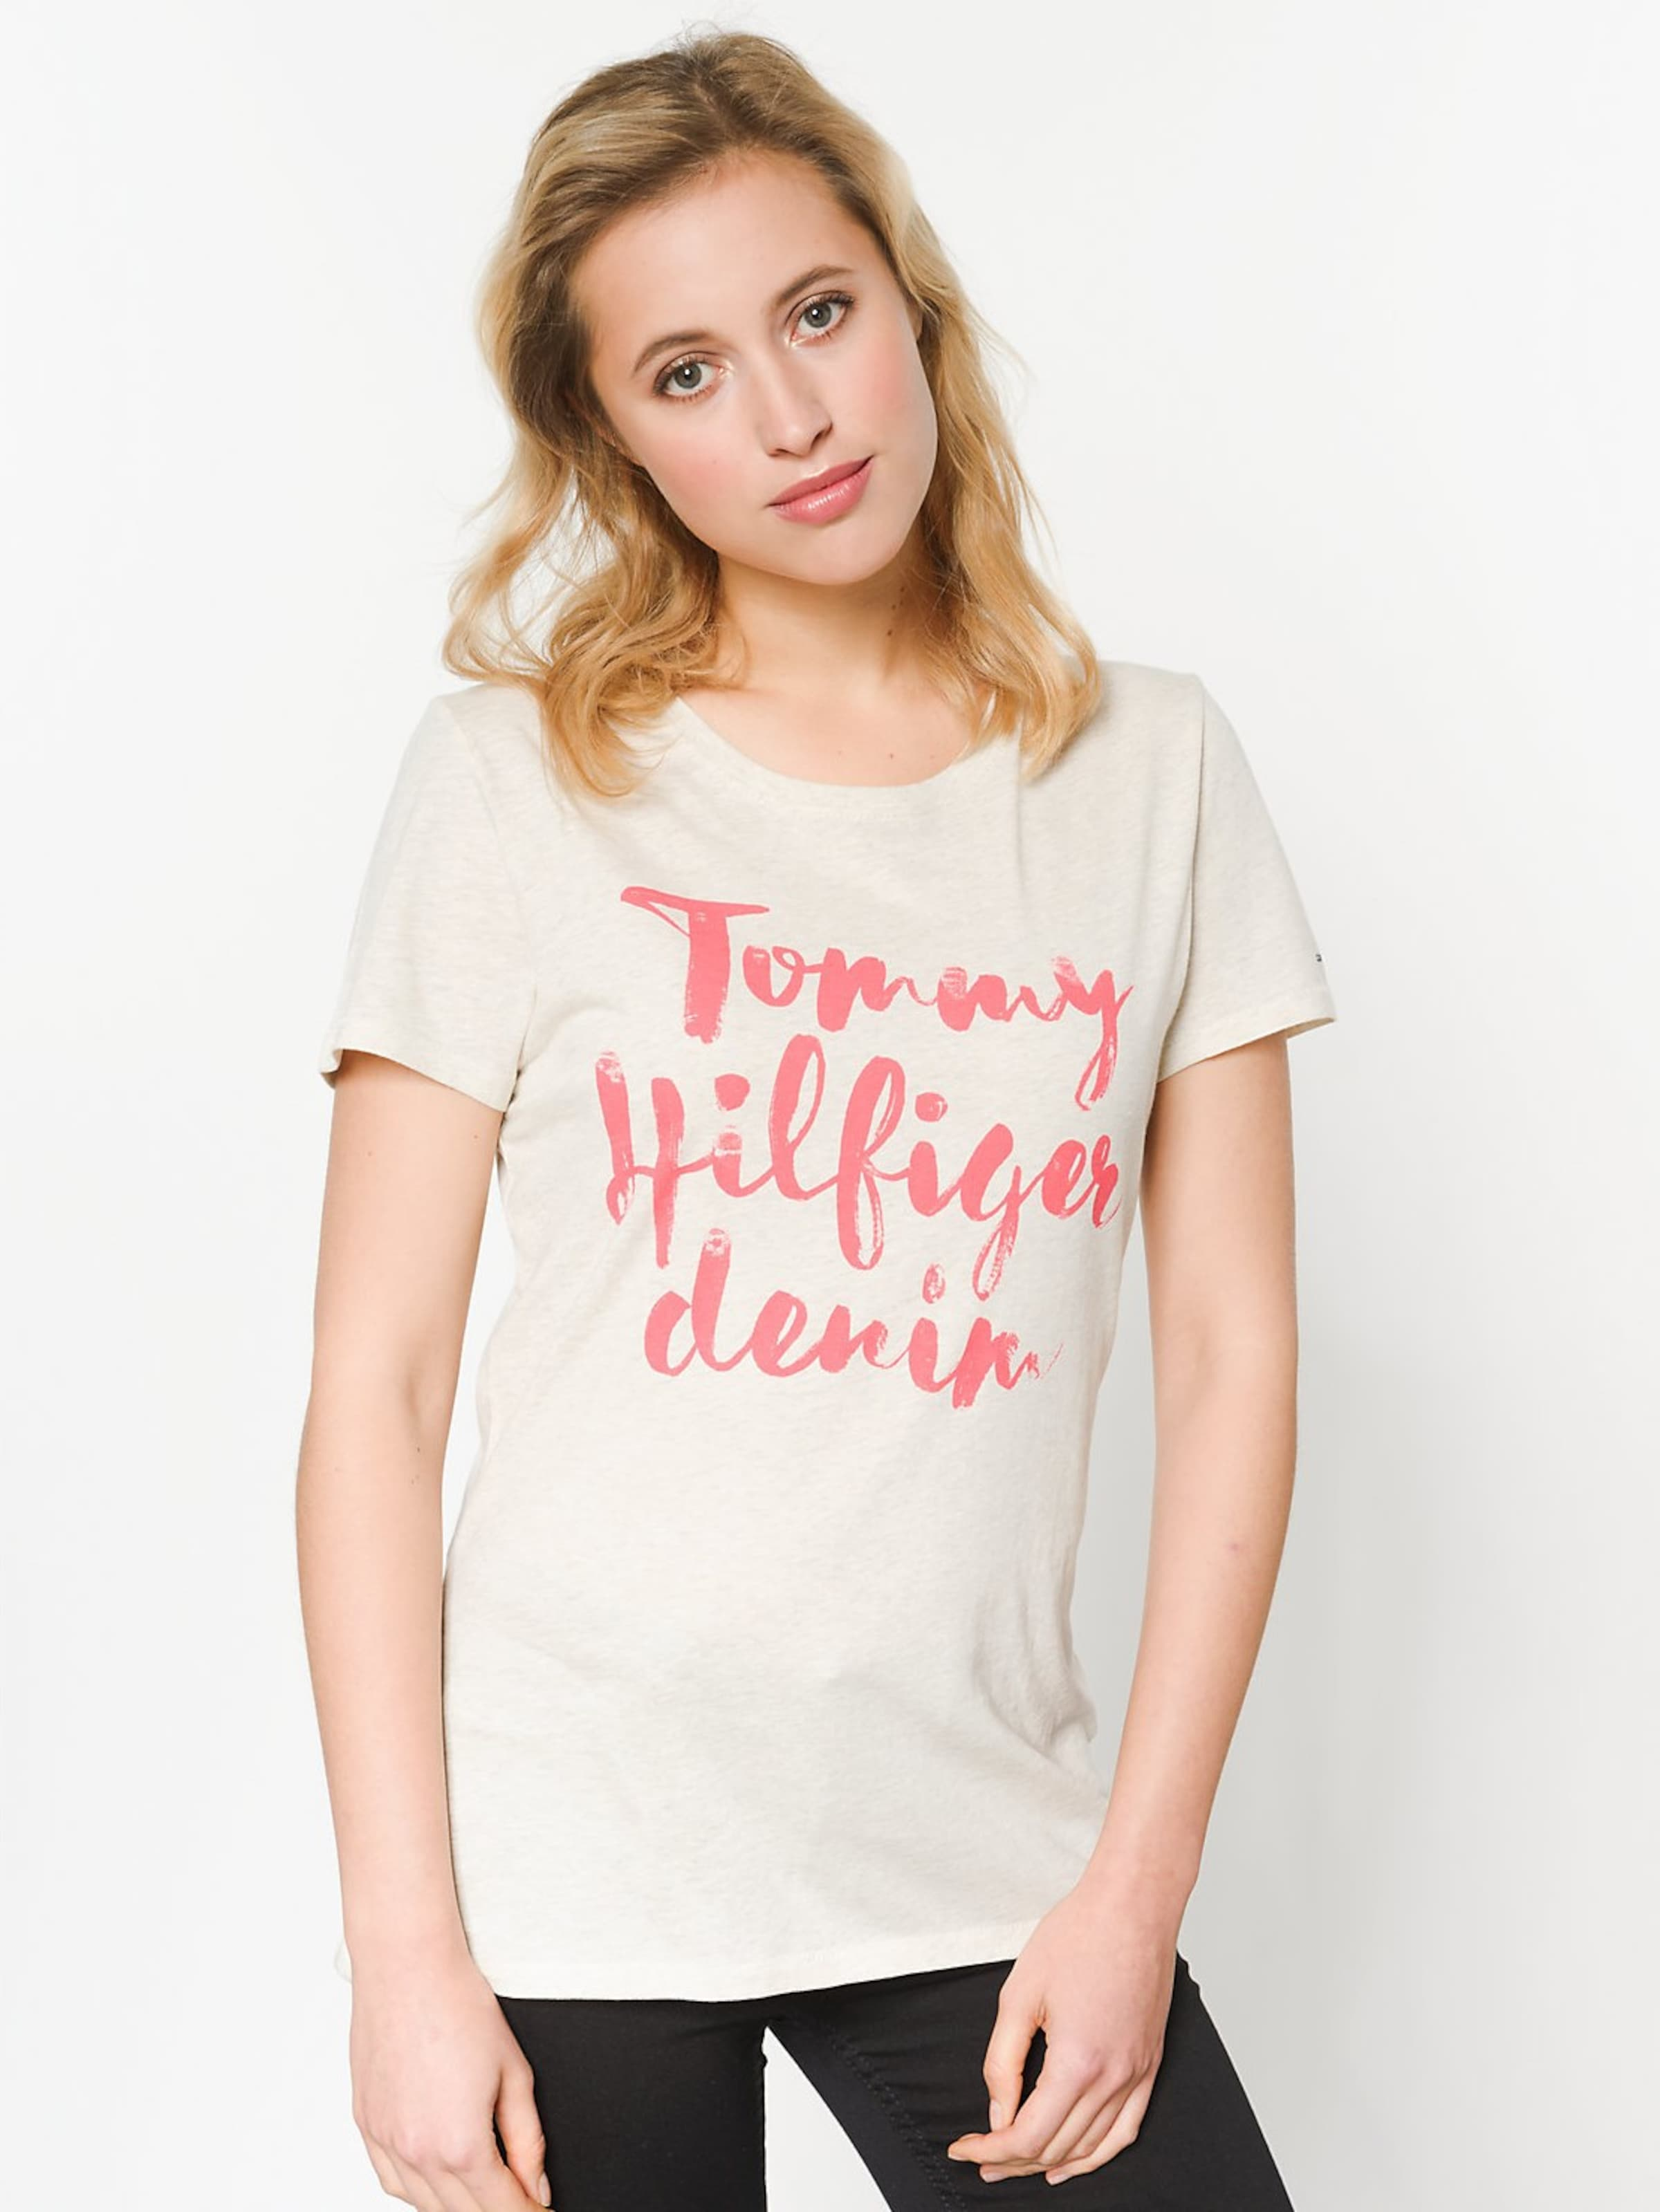 Tommy Jeans T-Shirt Billig 100% Original Verkauf Freies Verschiffen Wzzl1auPZU